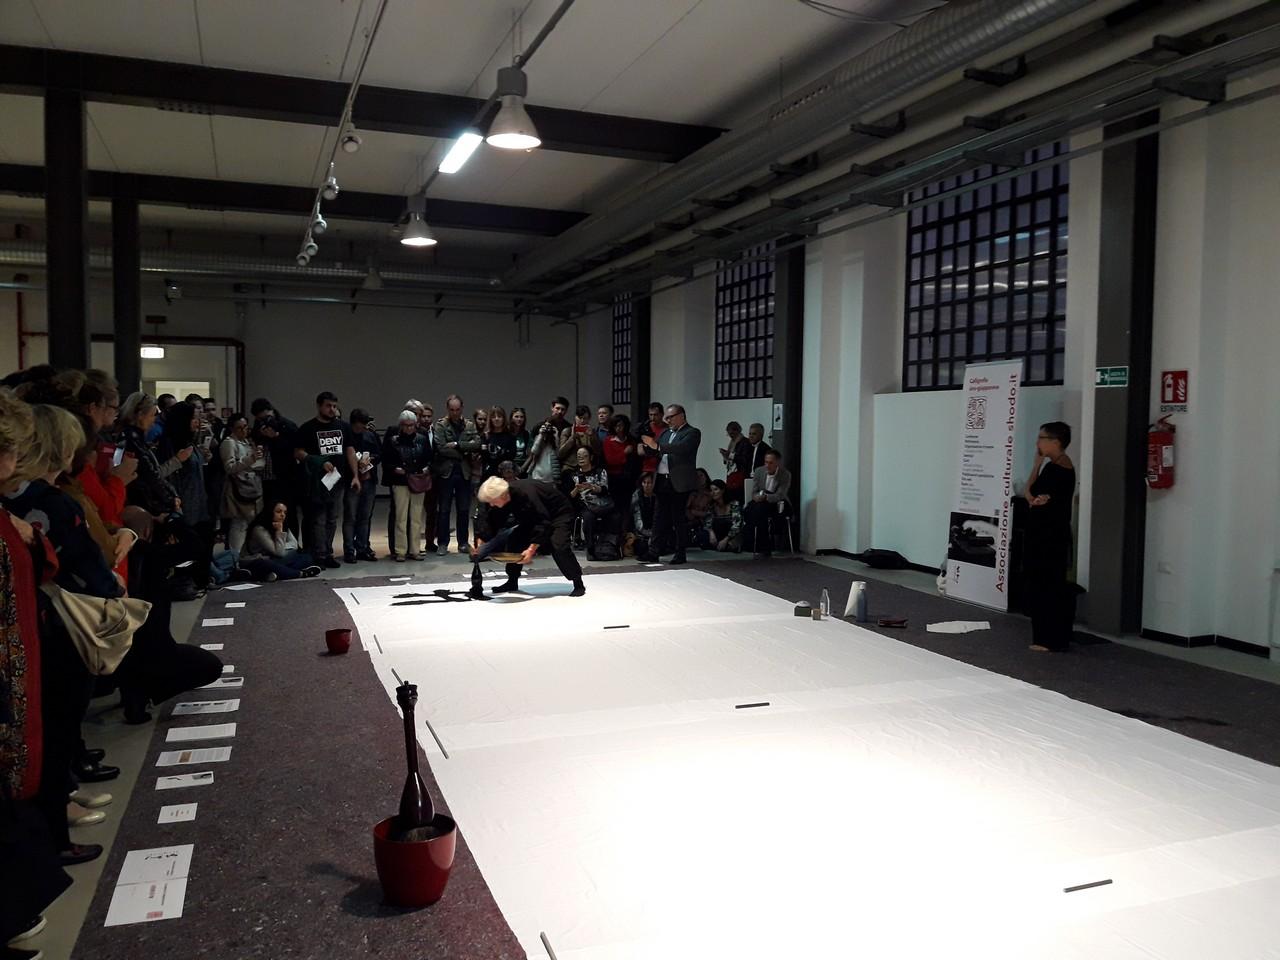 JapanFestival-Milano2018-fotoPagineZeni_002